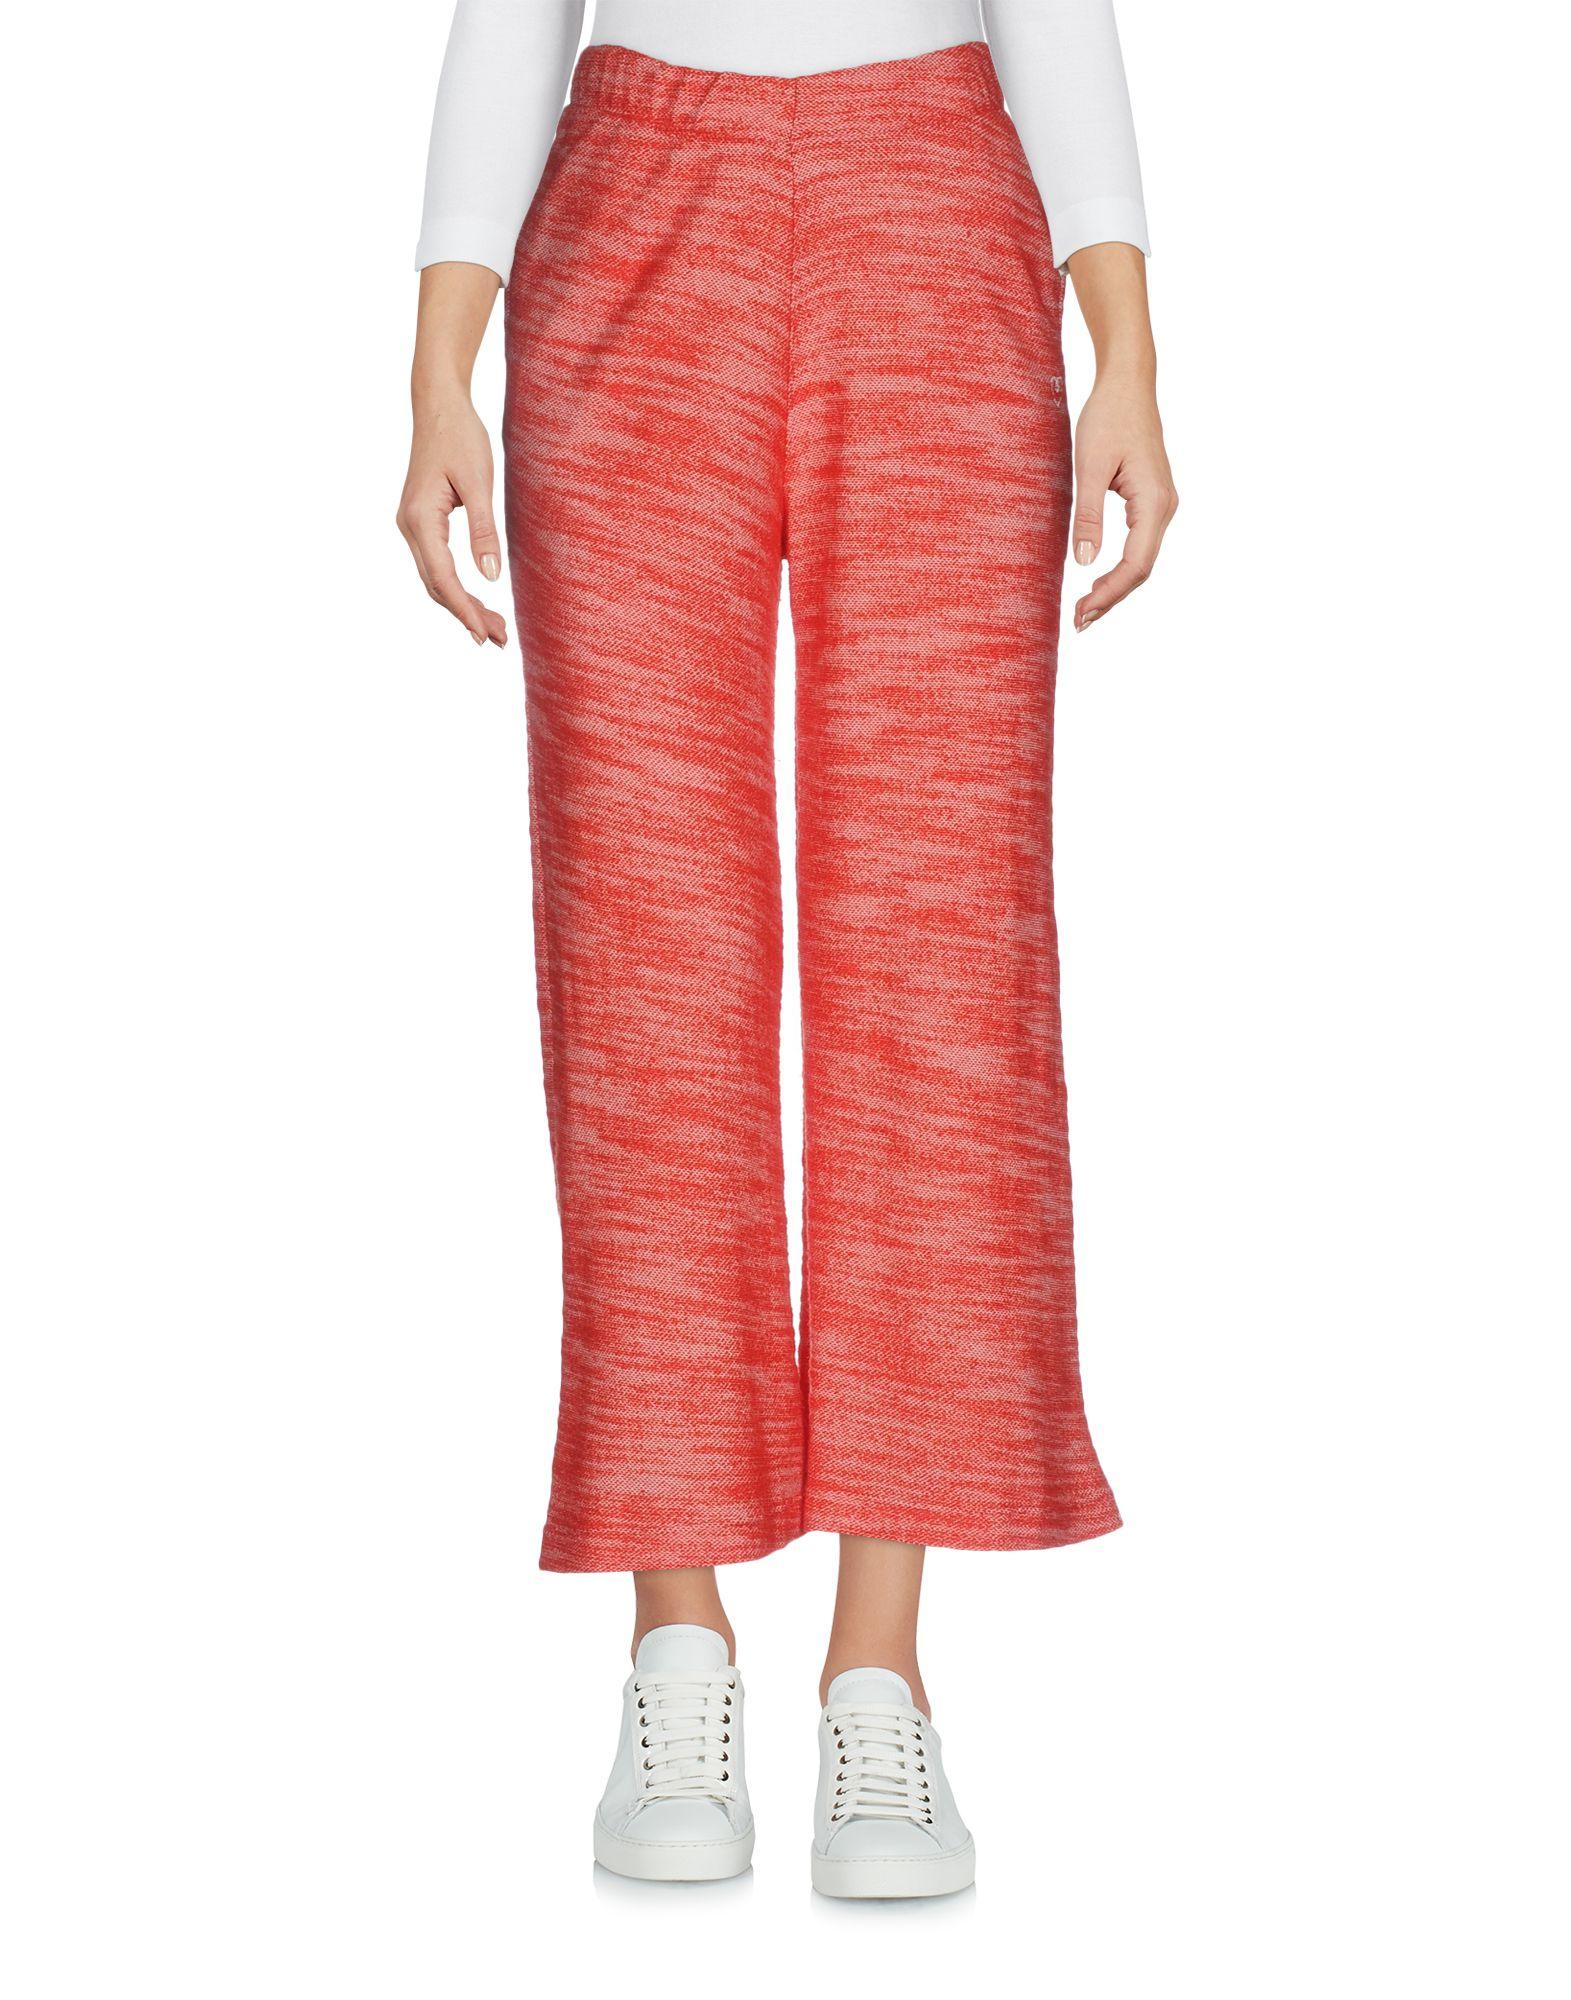 Pantaloni Cropped E Culottes The Hip Tee damen - 13155640VH